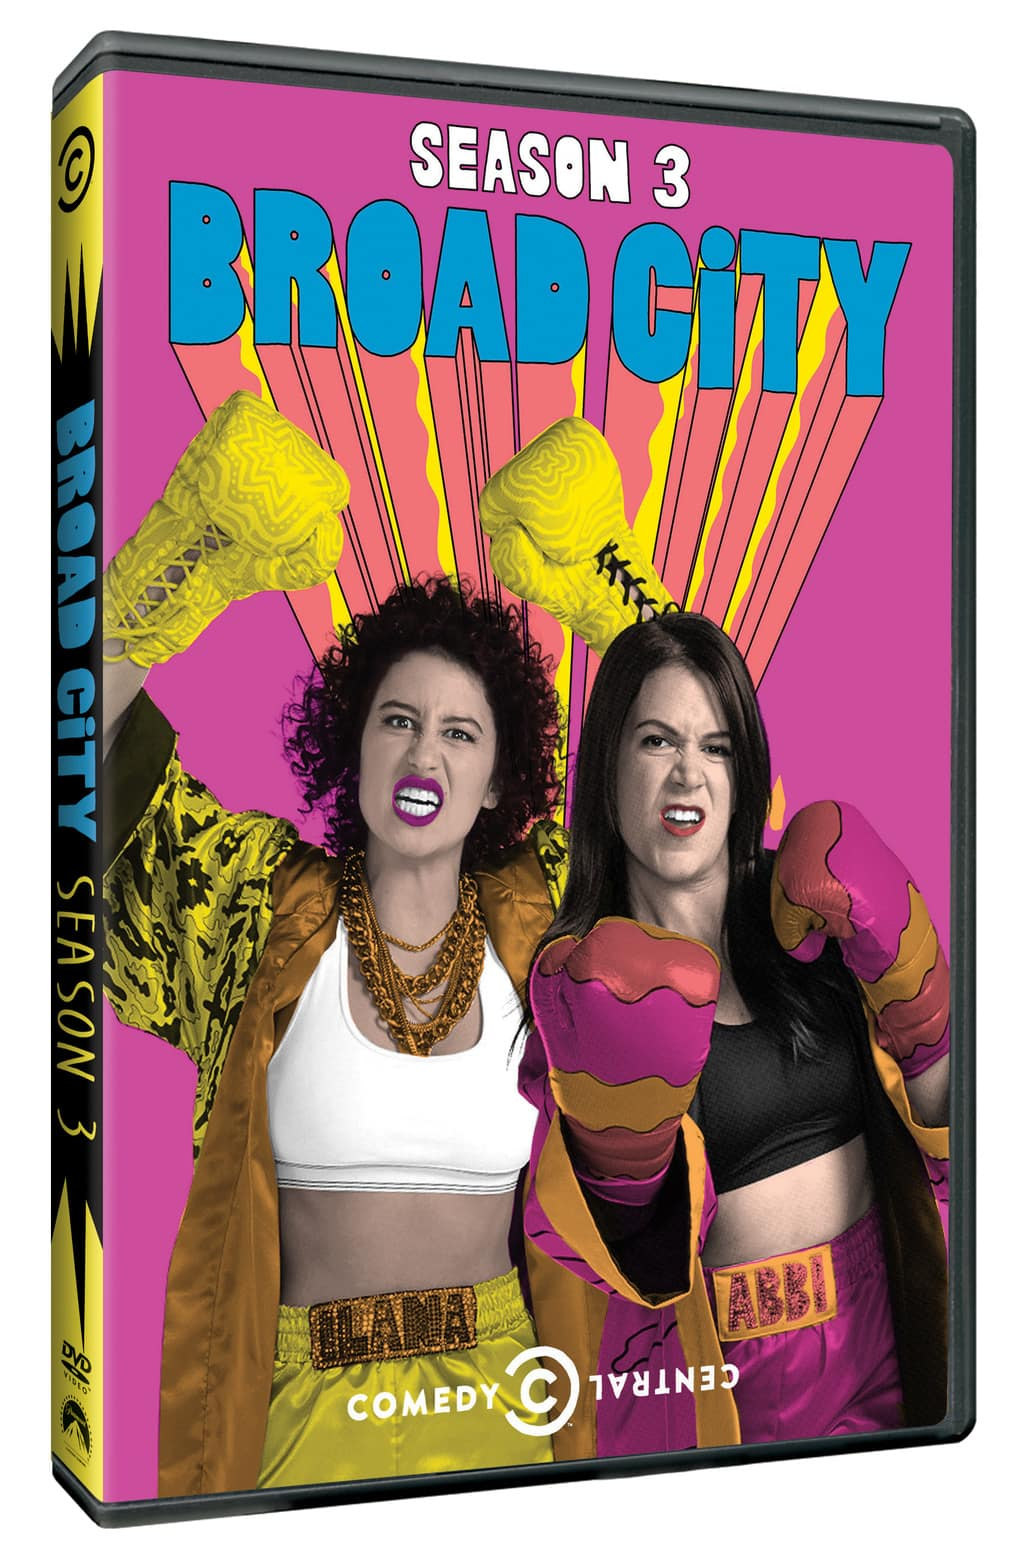 Broad City Season 3 on DVD